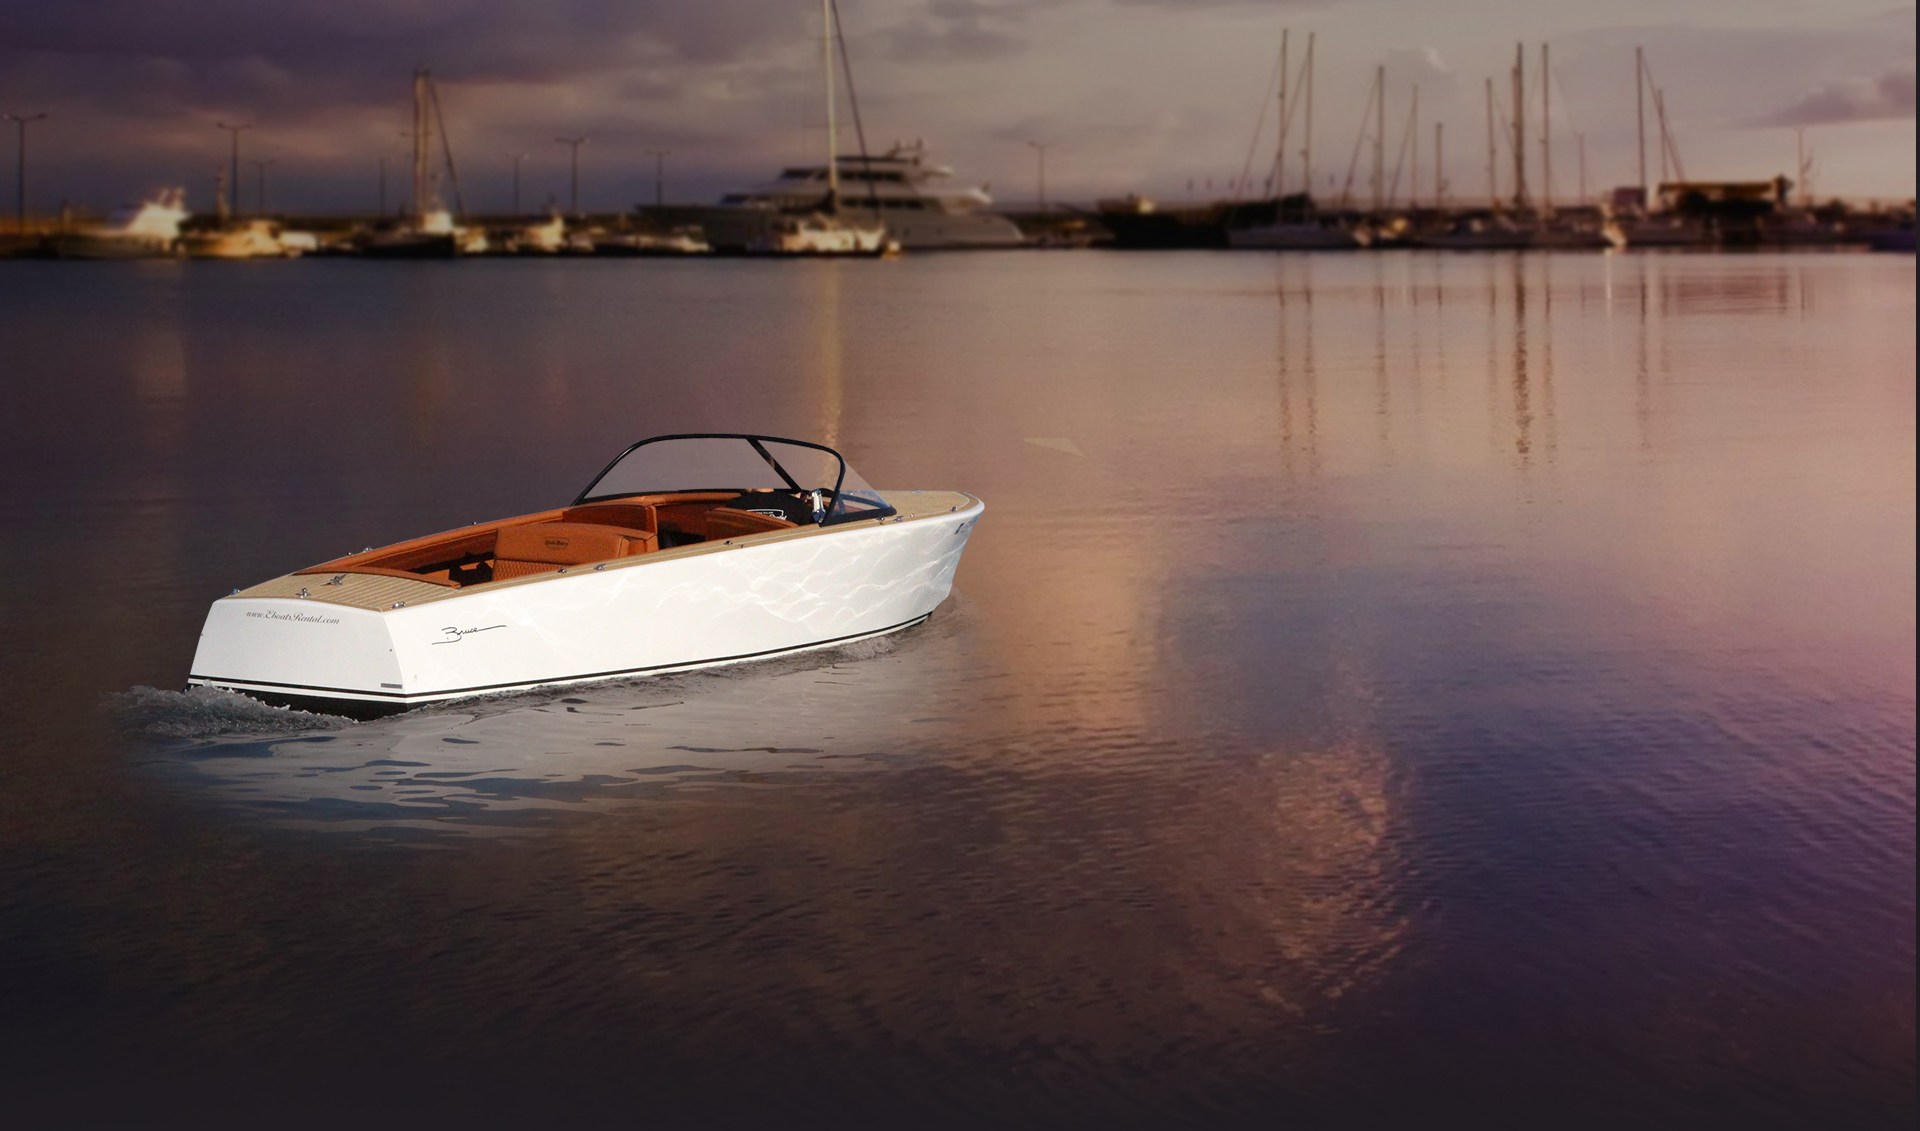 Newport Beach Electric Boat Rentals | Duffy Boat Rental | Newest Boats!